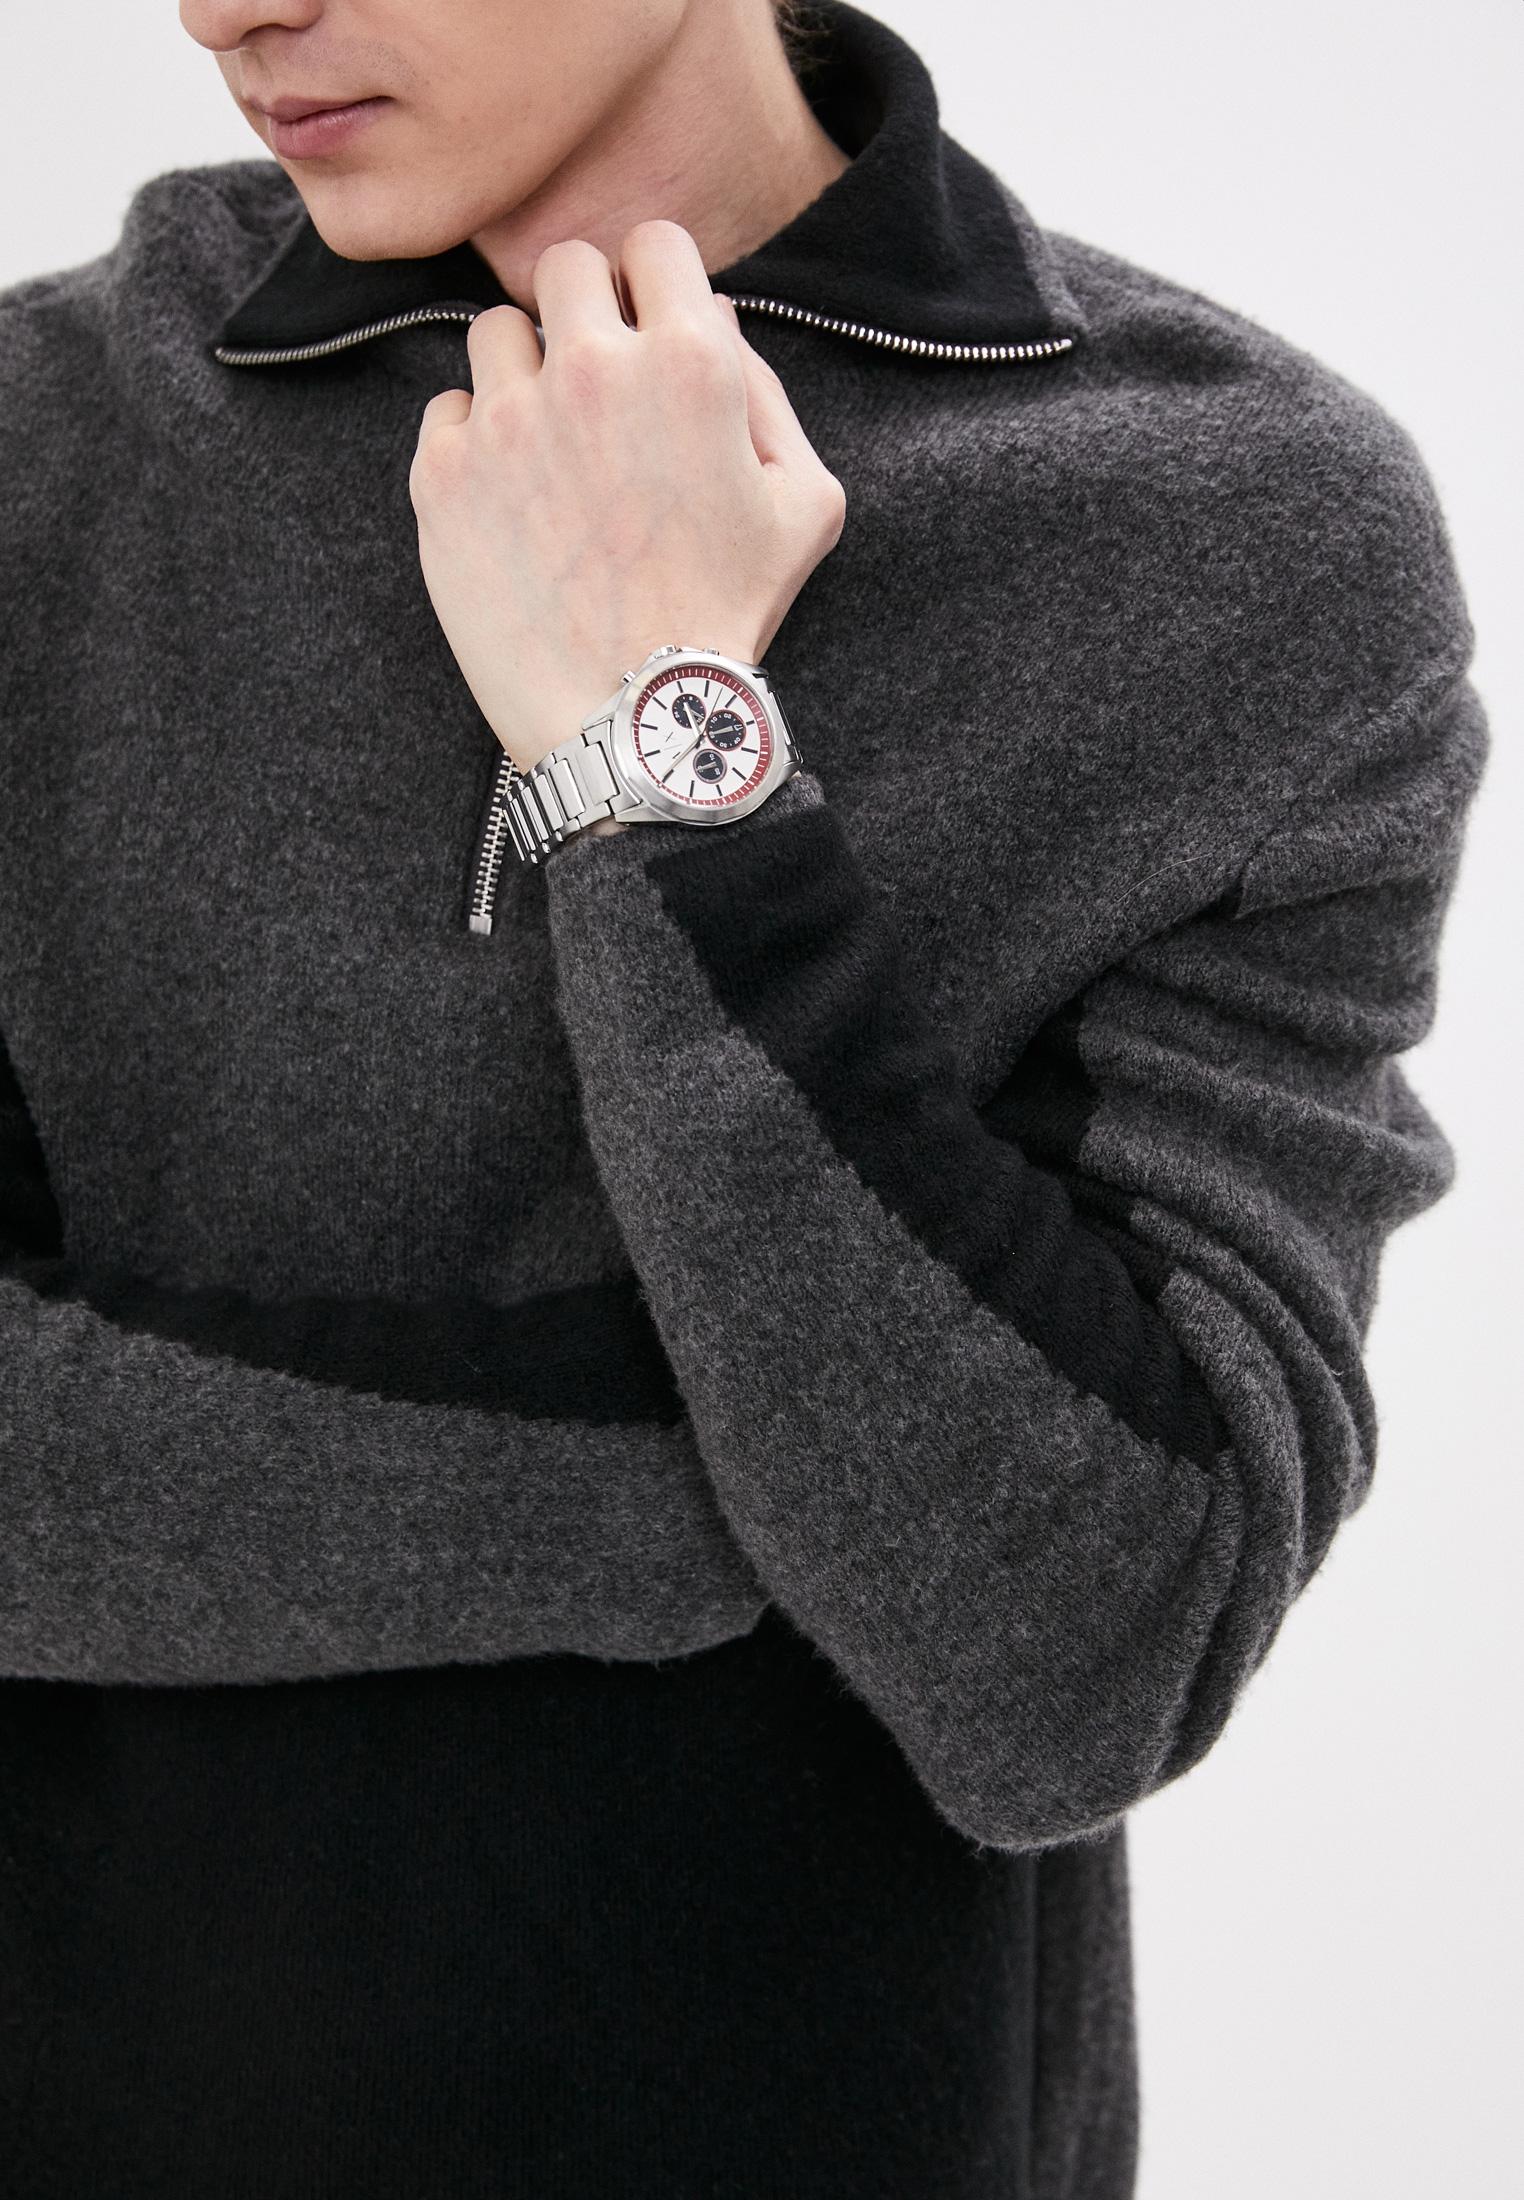 Мужские часы Armani Exchange AX2646